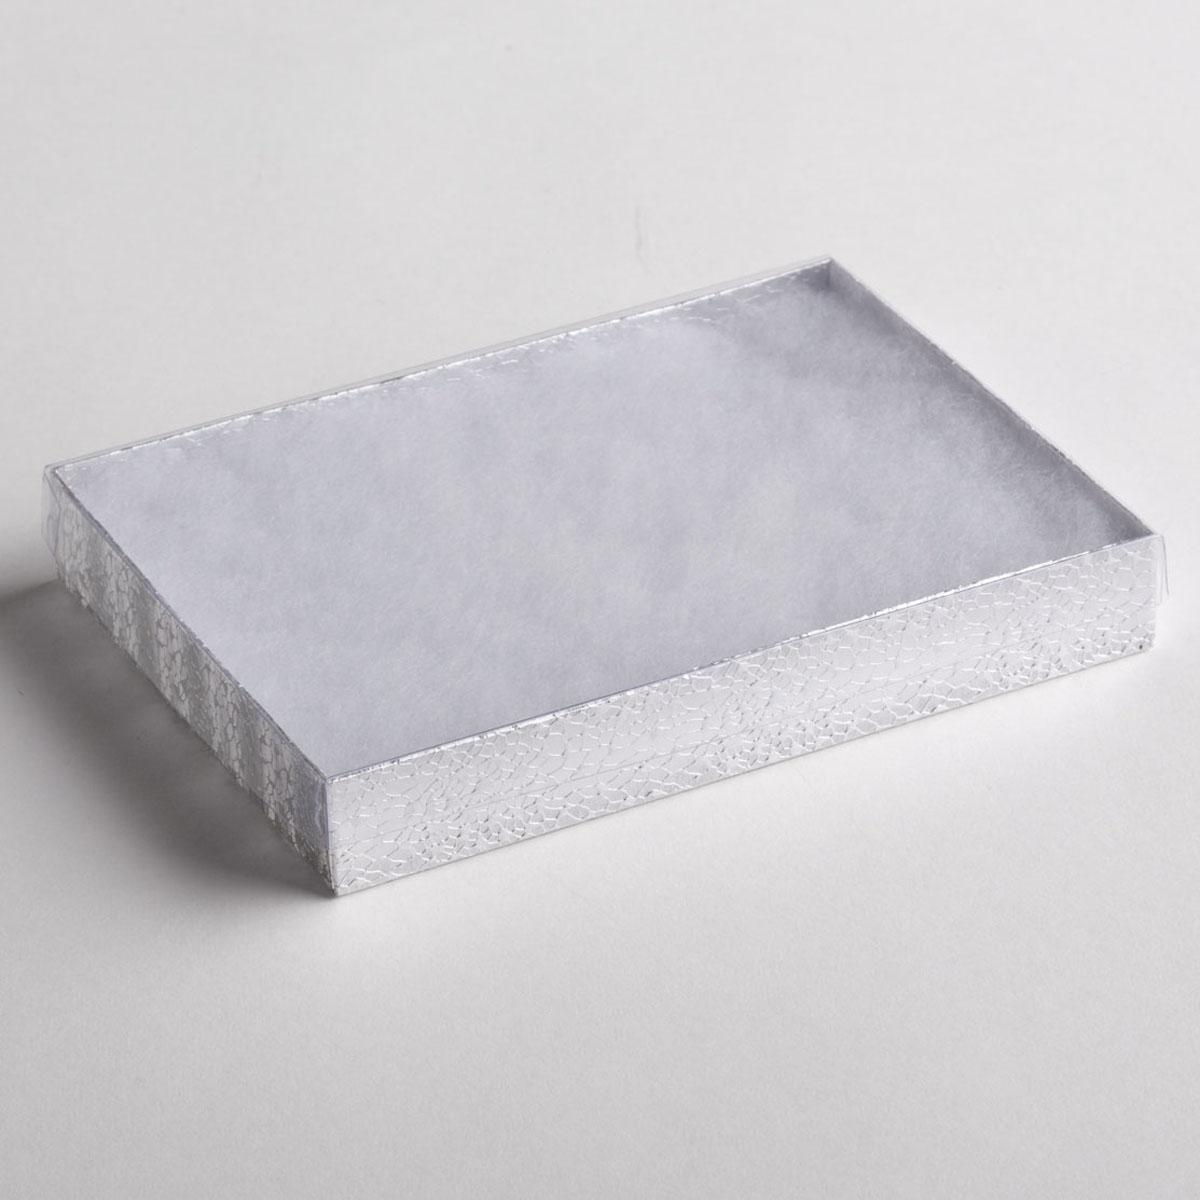 Silver Texture Necklace Boxes